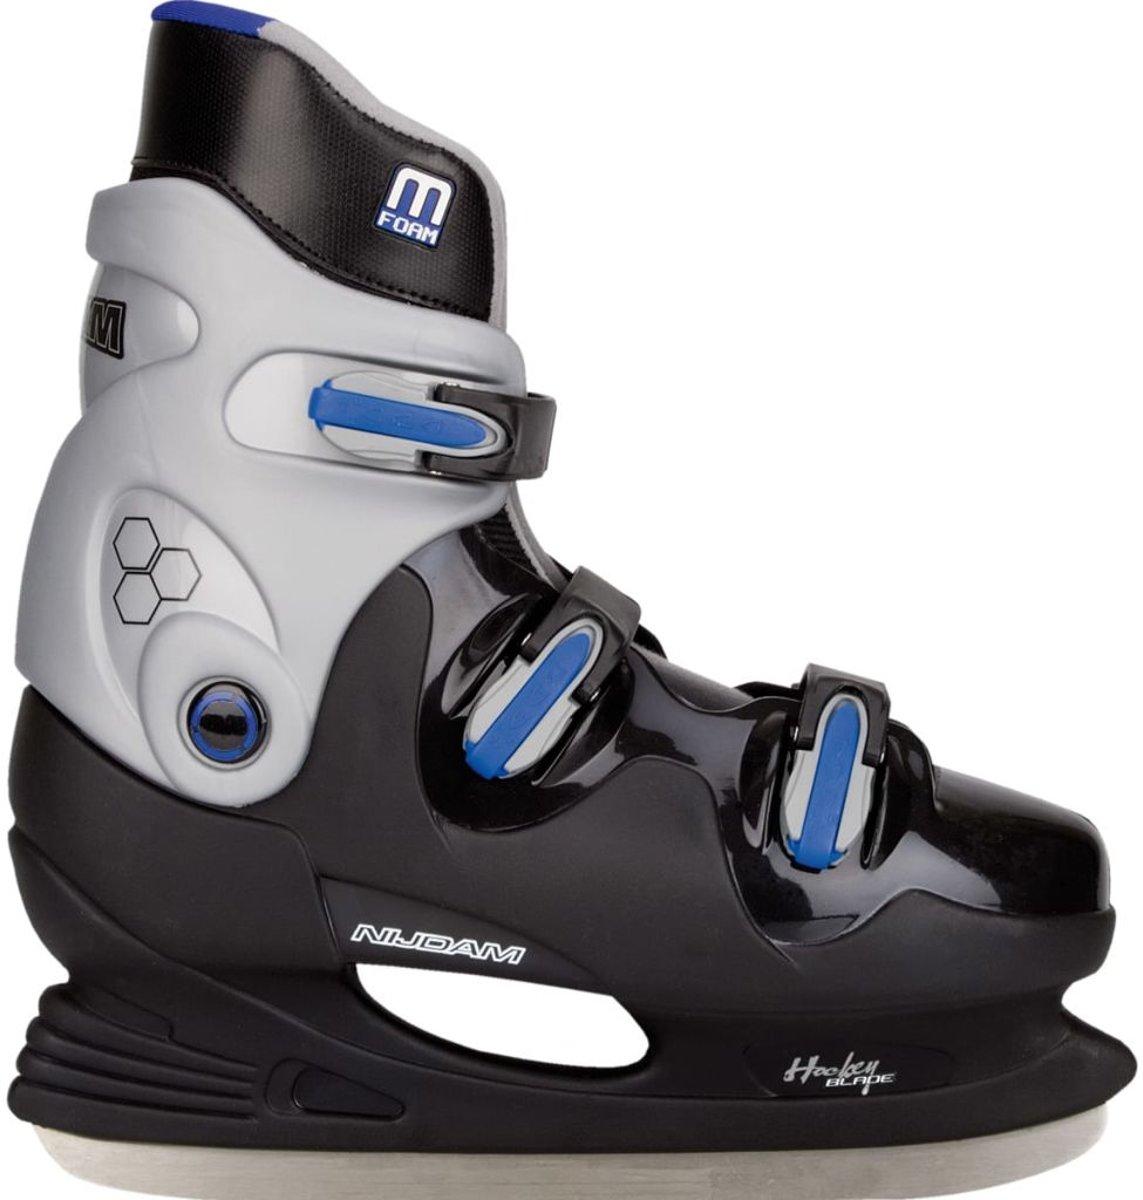 Nijdam 0089 IJshockeyschaats - Hardboot - Zwart/Blauw - Maat 42